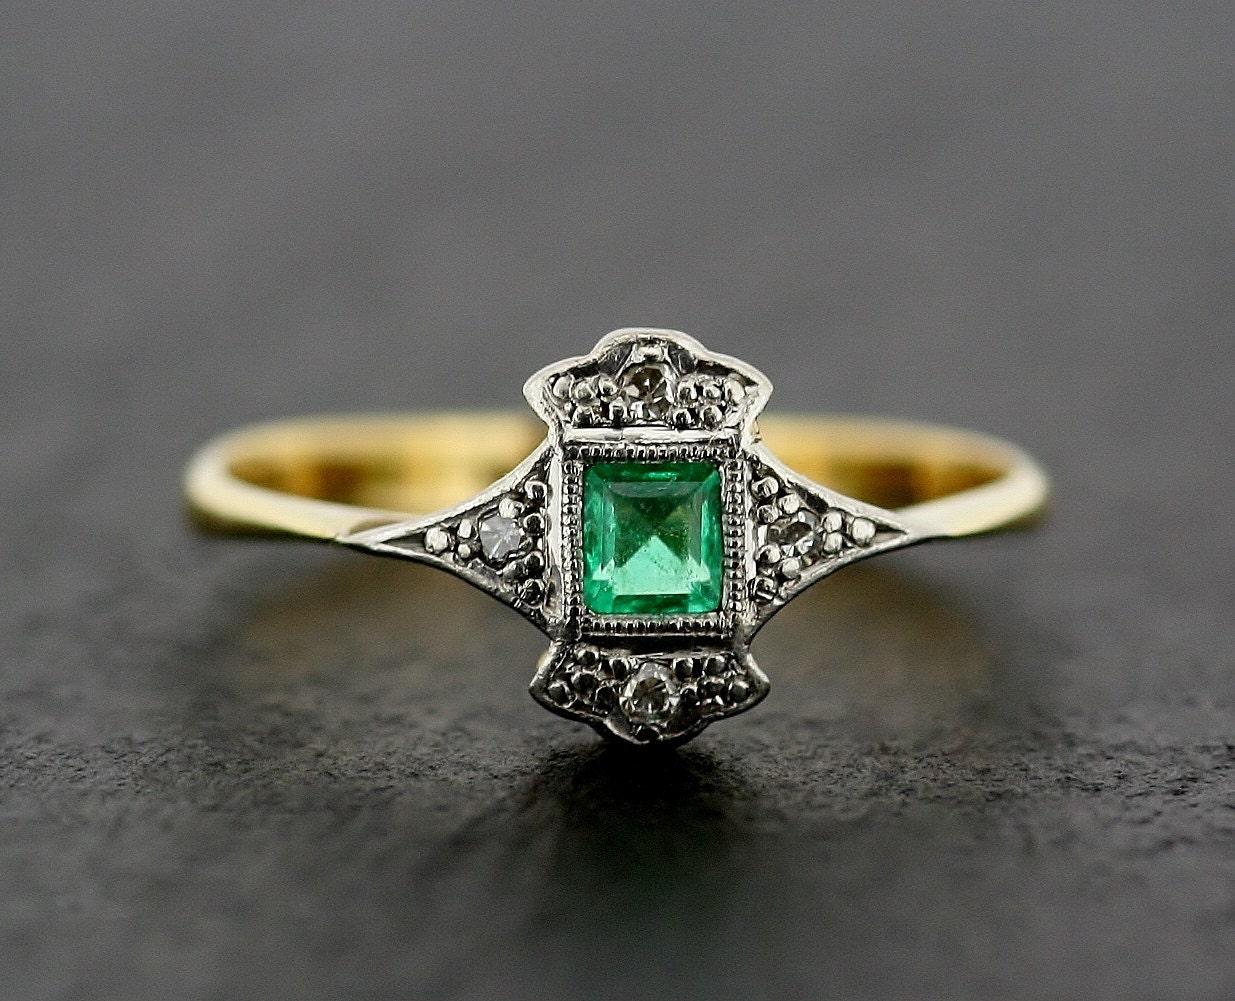 Art Deco Emerald Ring Antique Art Deco Emerald & Diamond  Art Deco Emeral...